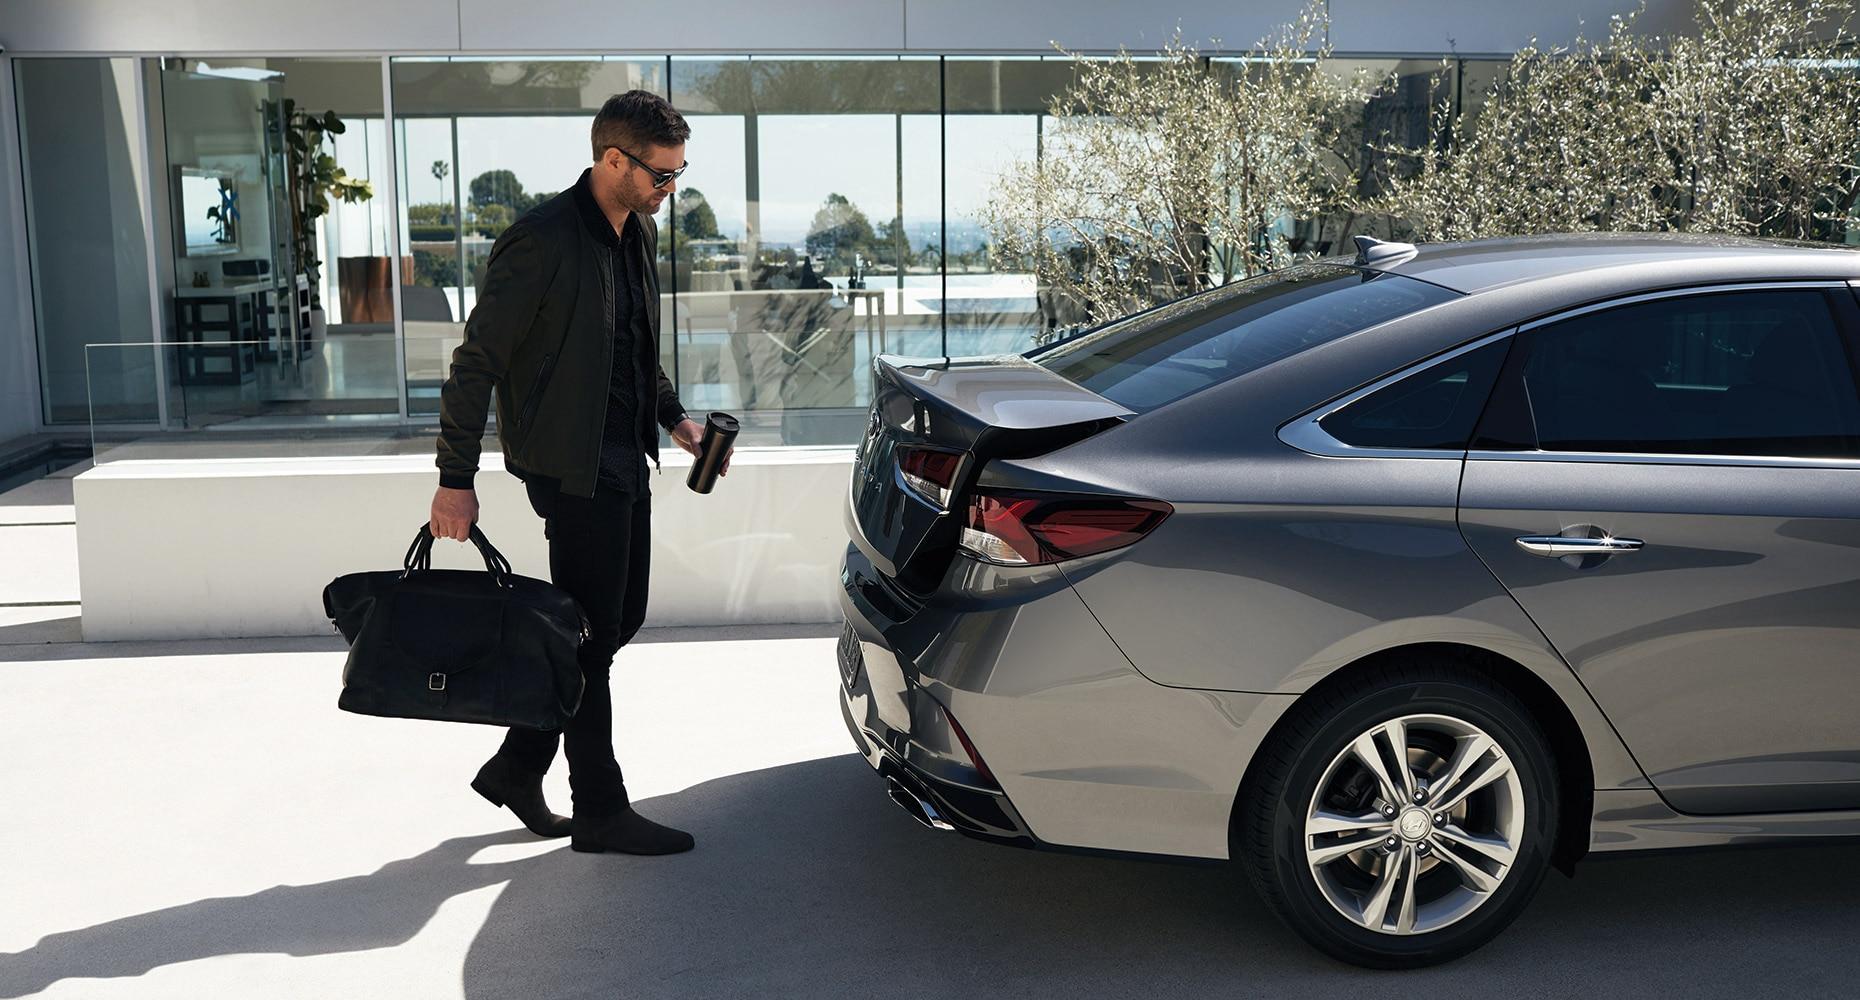 Hands-free smart trunk